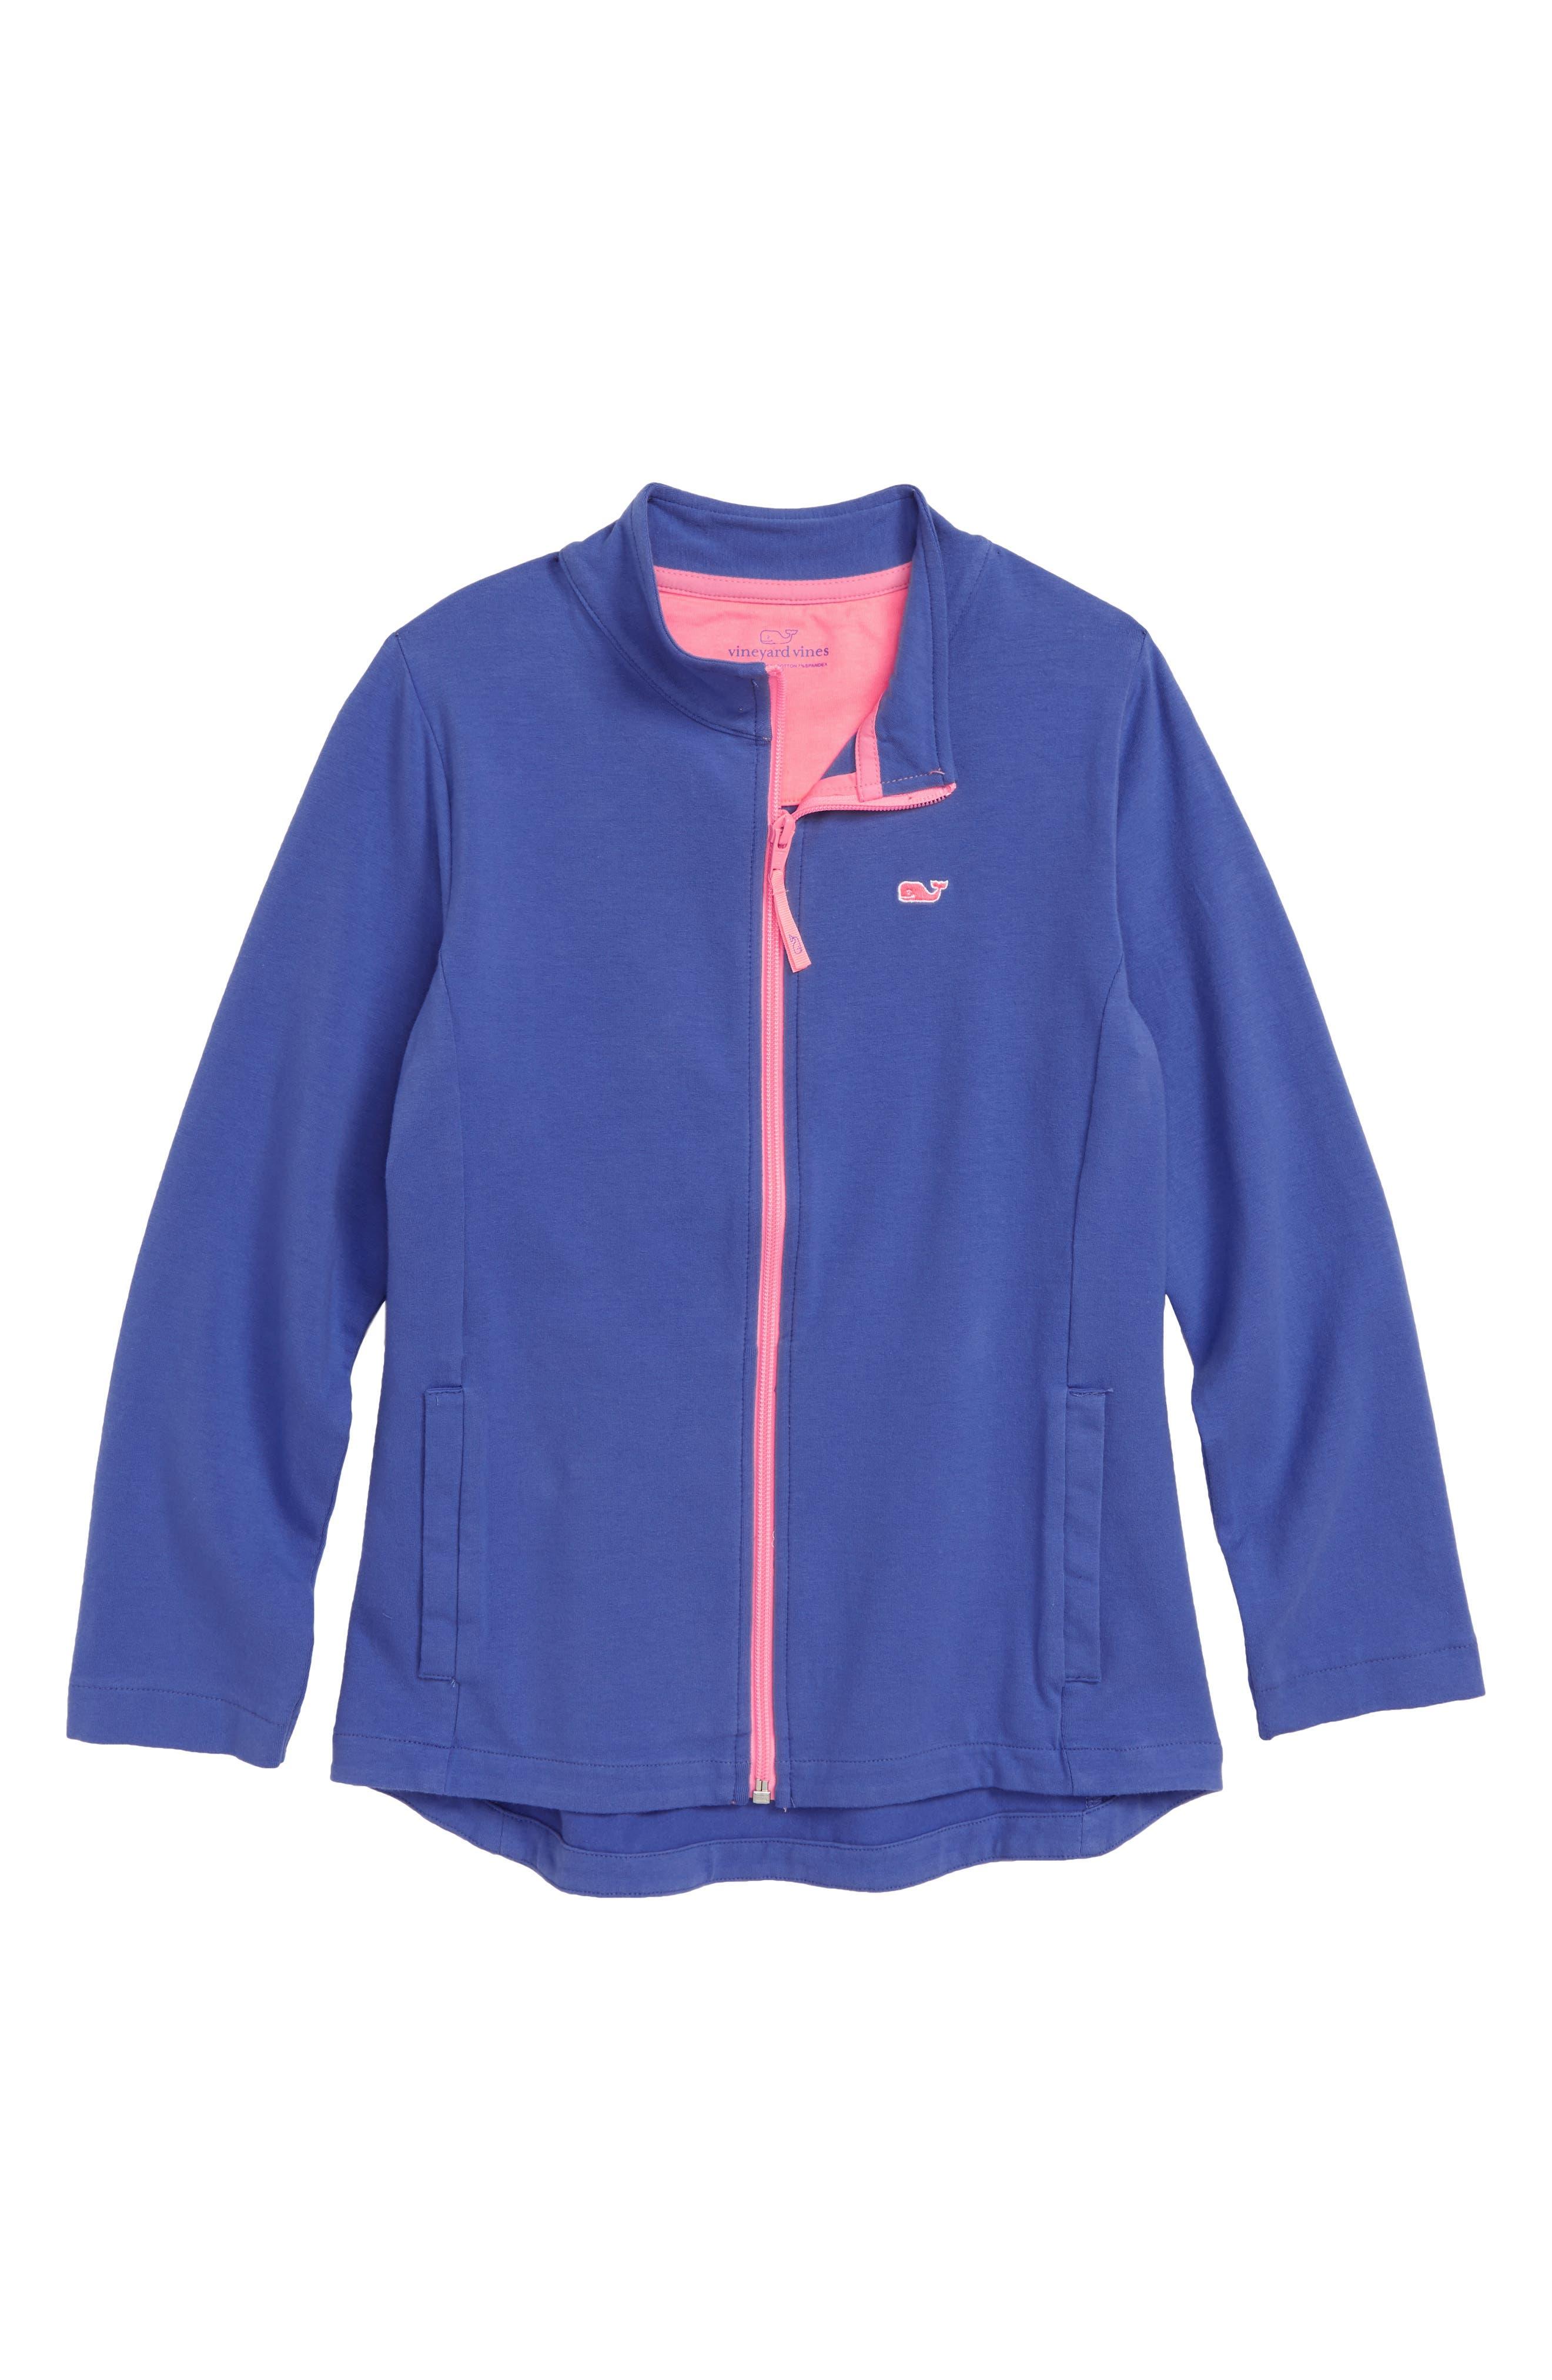 Full Zip Jacket,                         Main,                         color, MARLIN